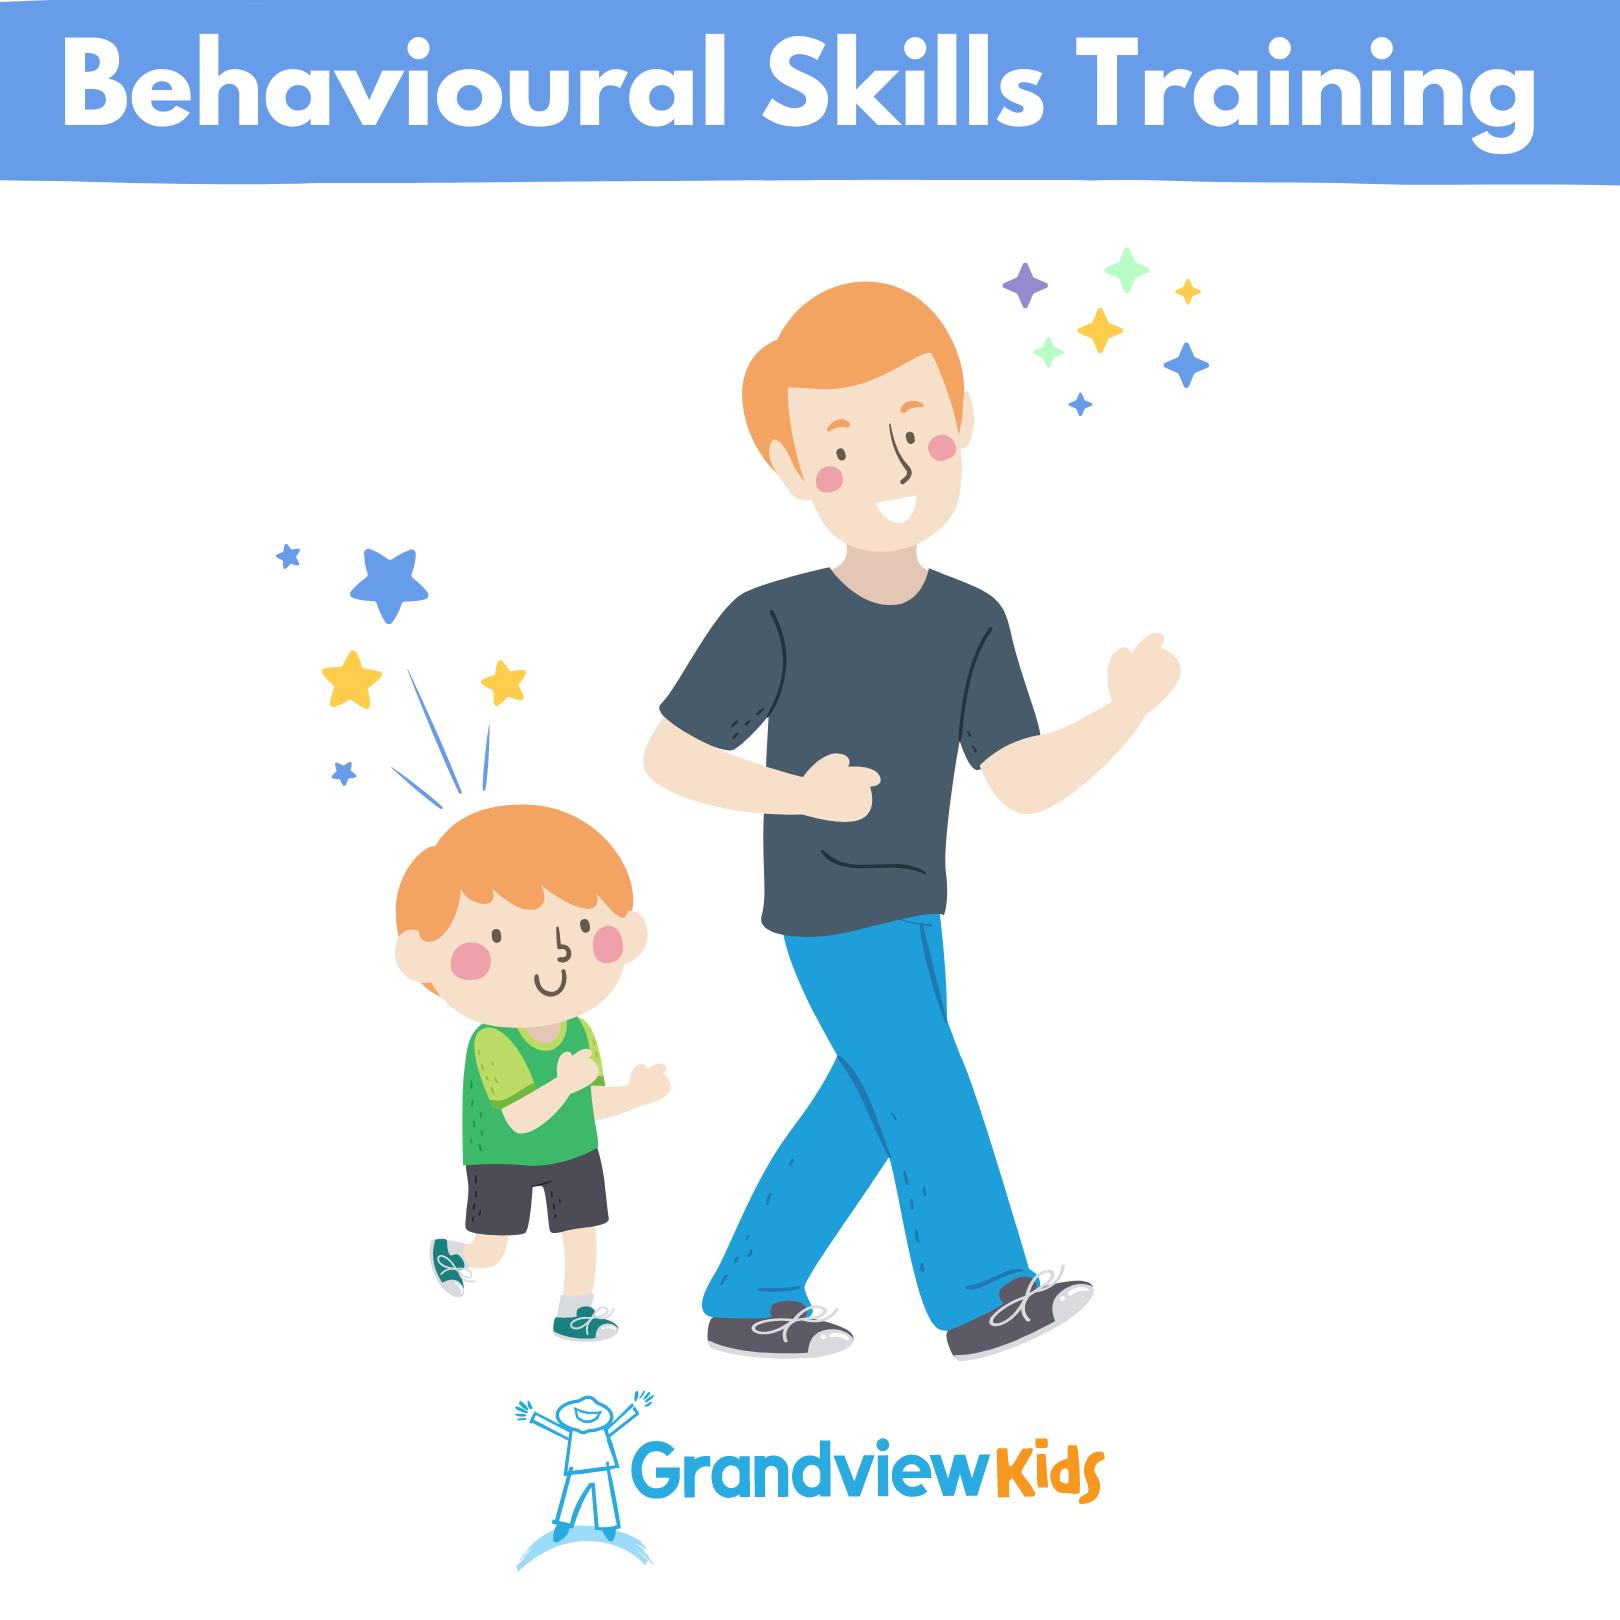 Behavioural Skills Training cover image